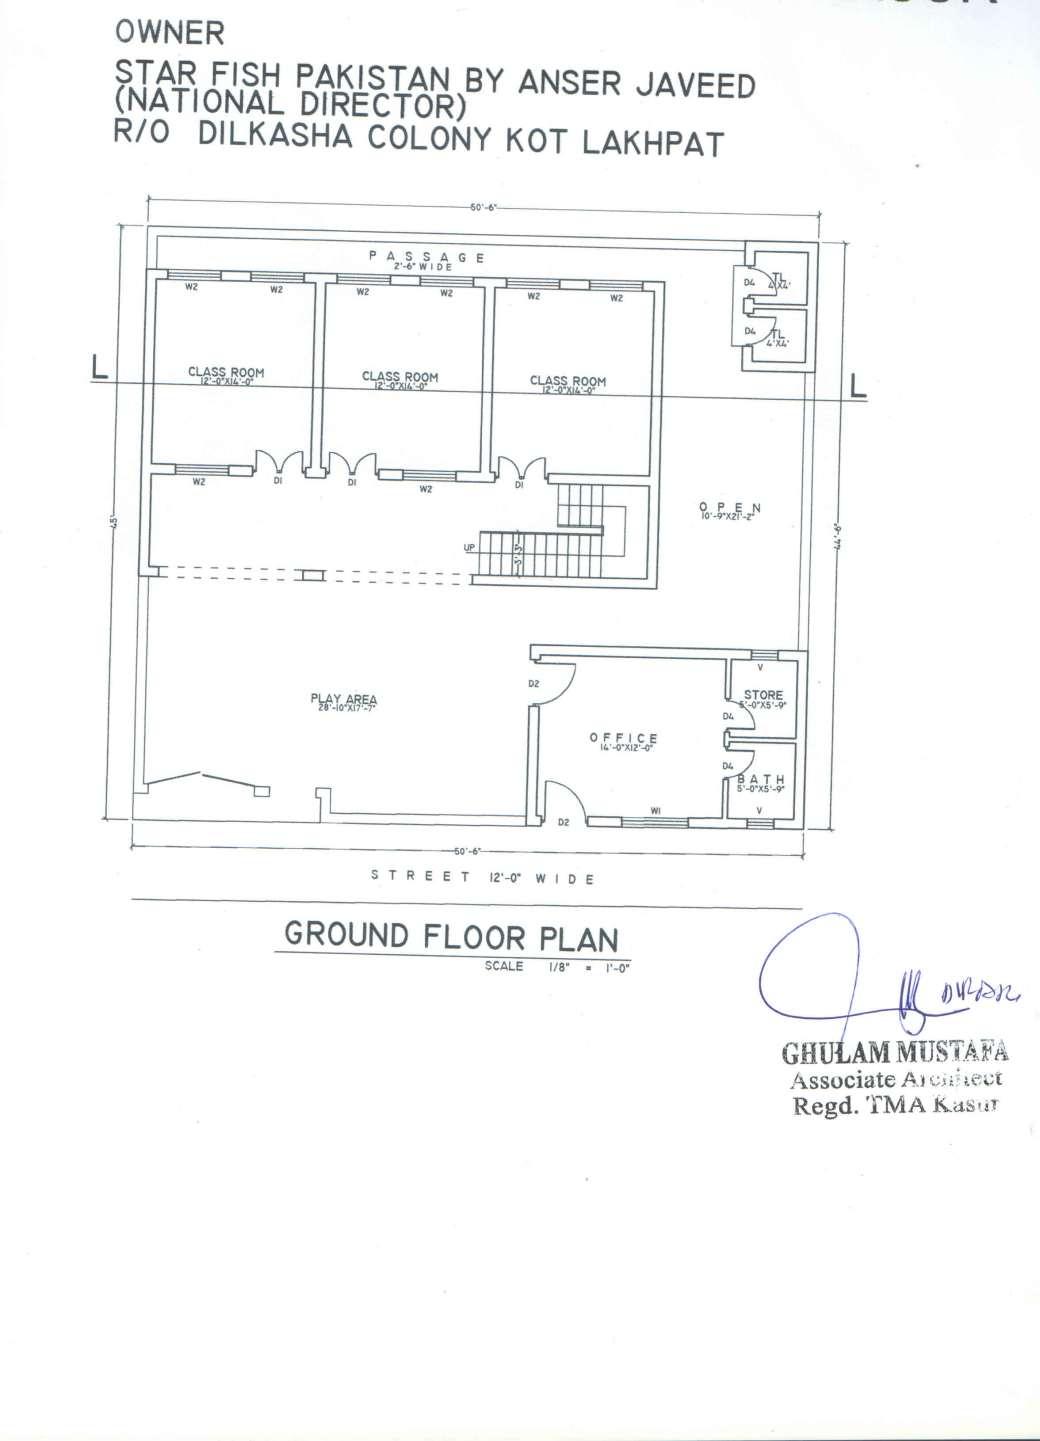 SketchMap-School-Buidling-Shama-Dec-15